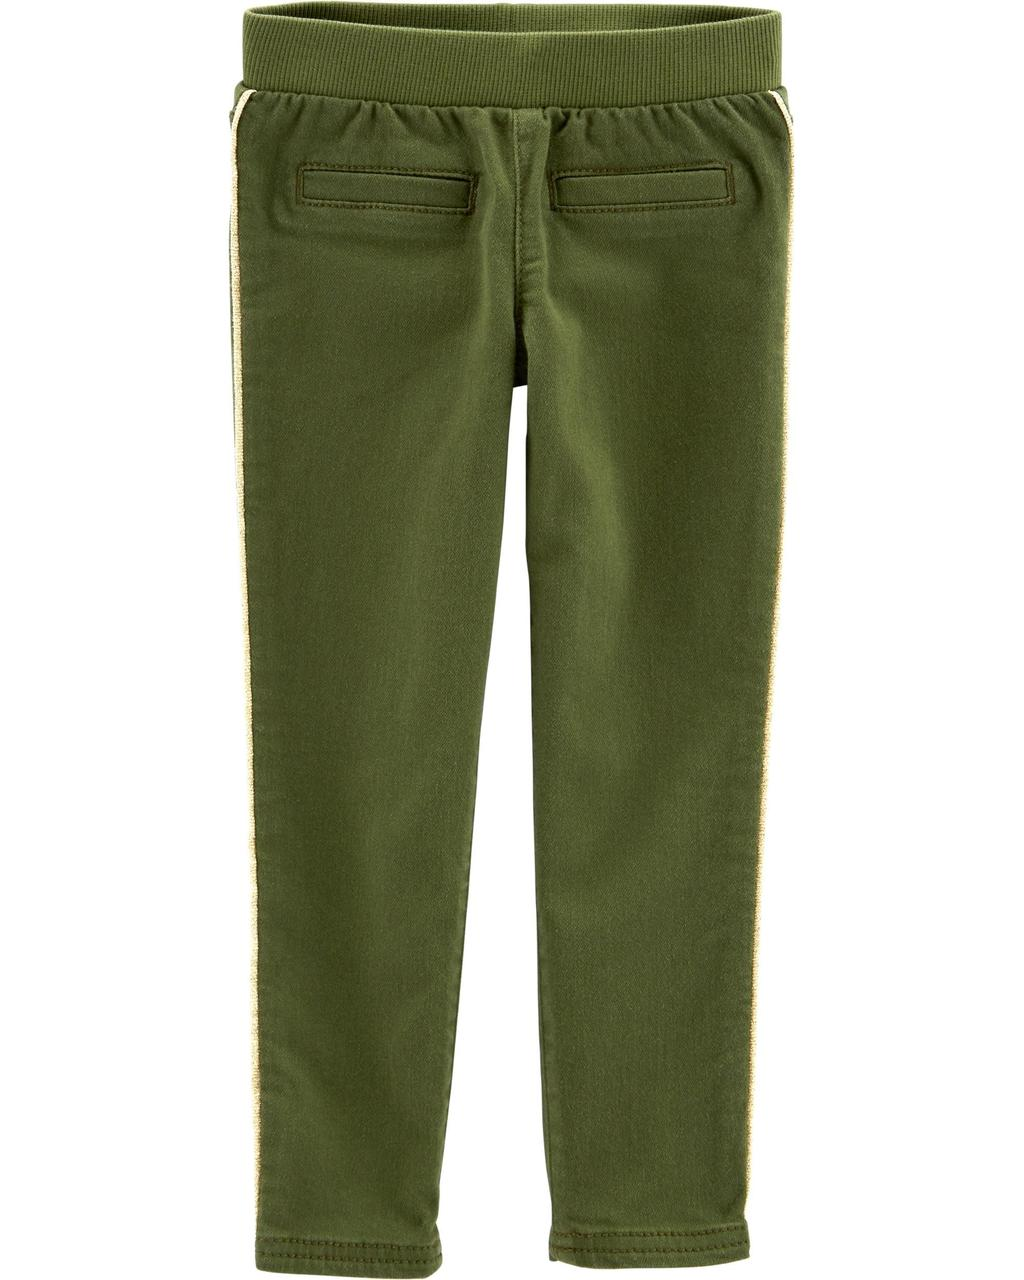 Штаны скини для девочки Carters (Картерс) оливка 12М(72-78 см)